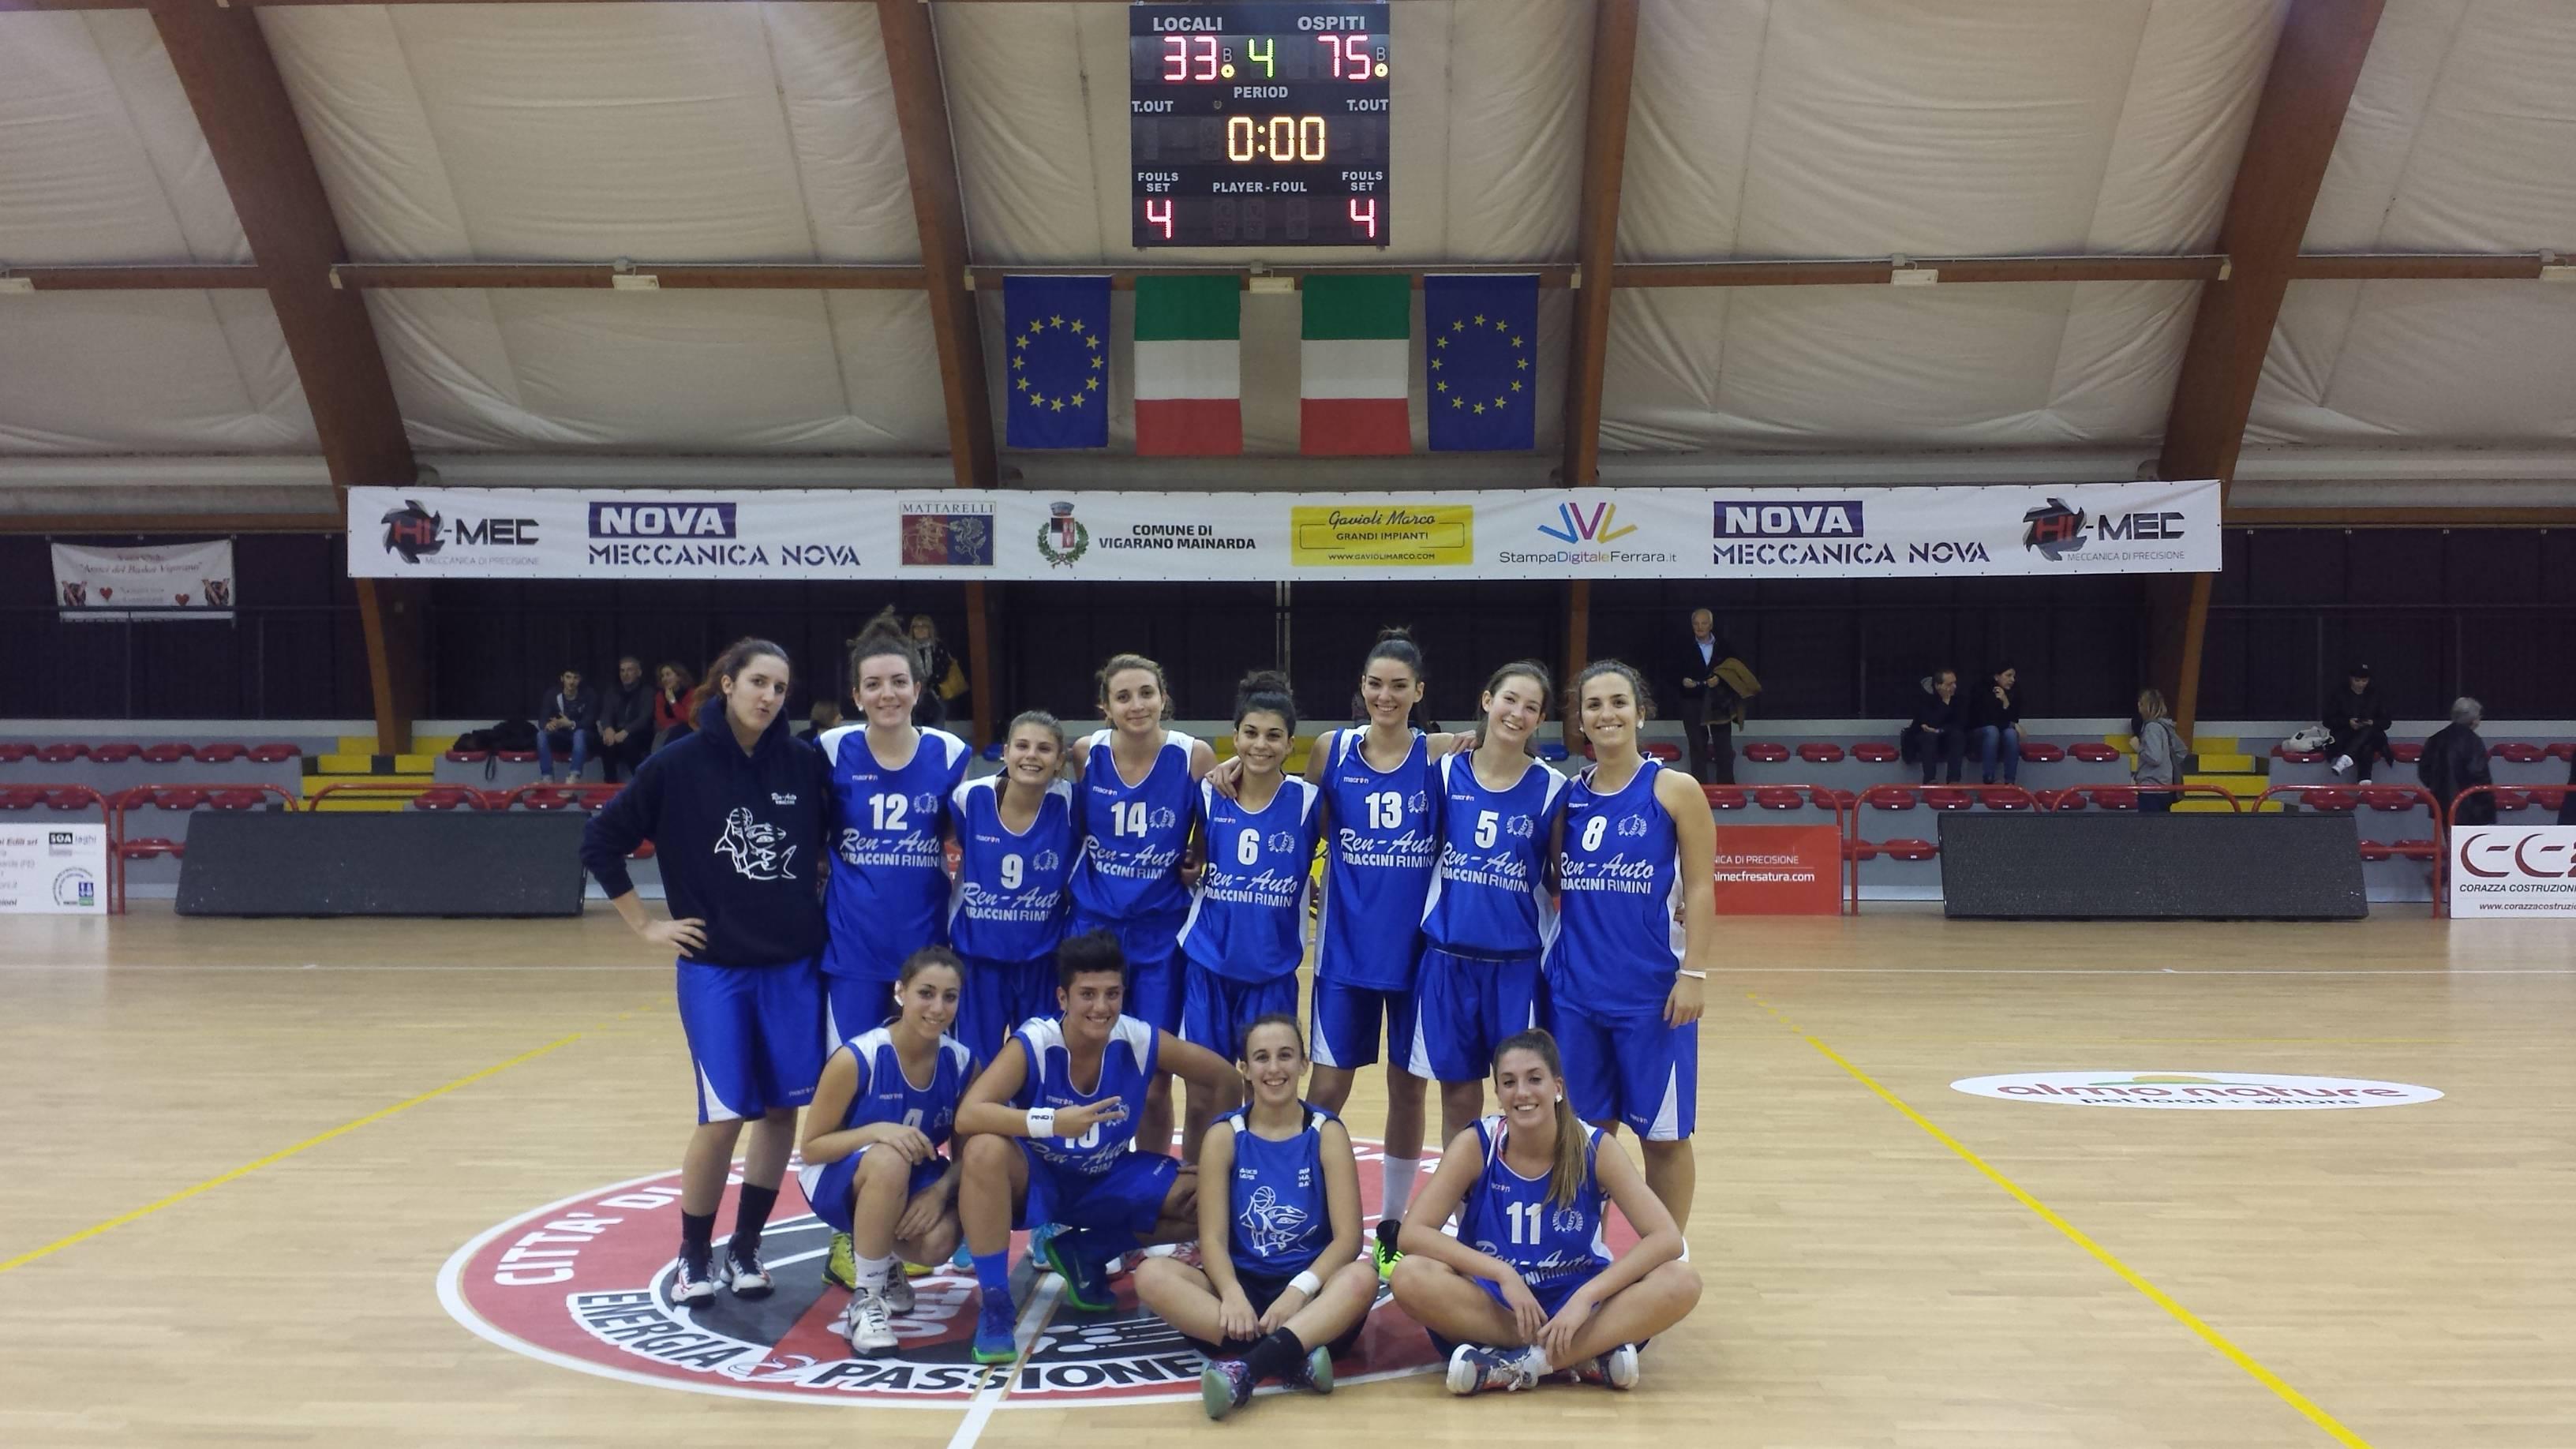 Academy Mirabello-RenAuto Rimini 33-75